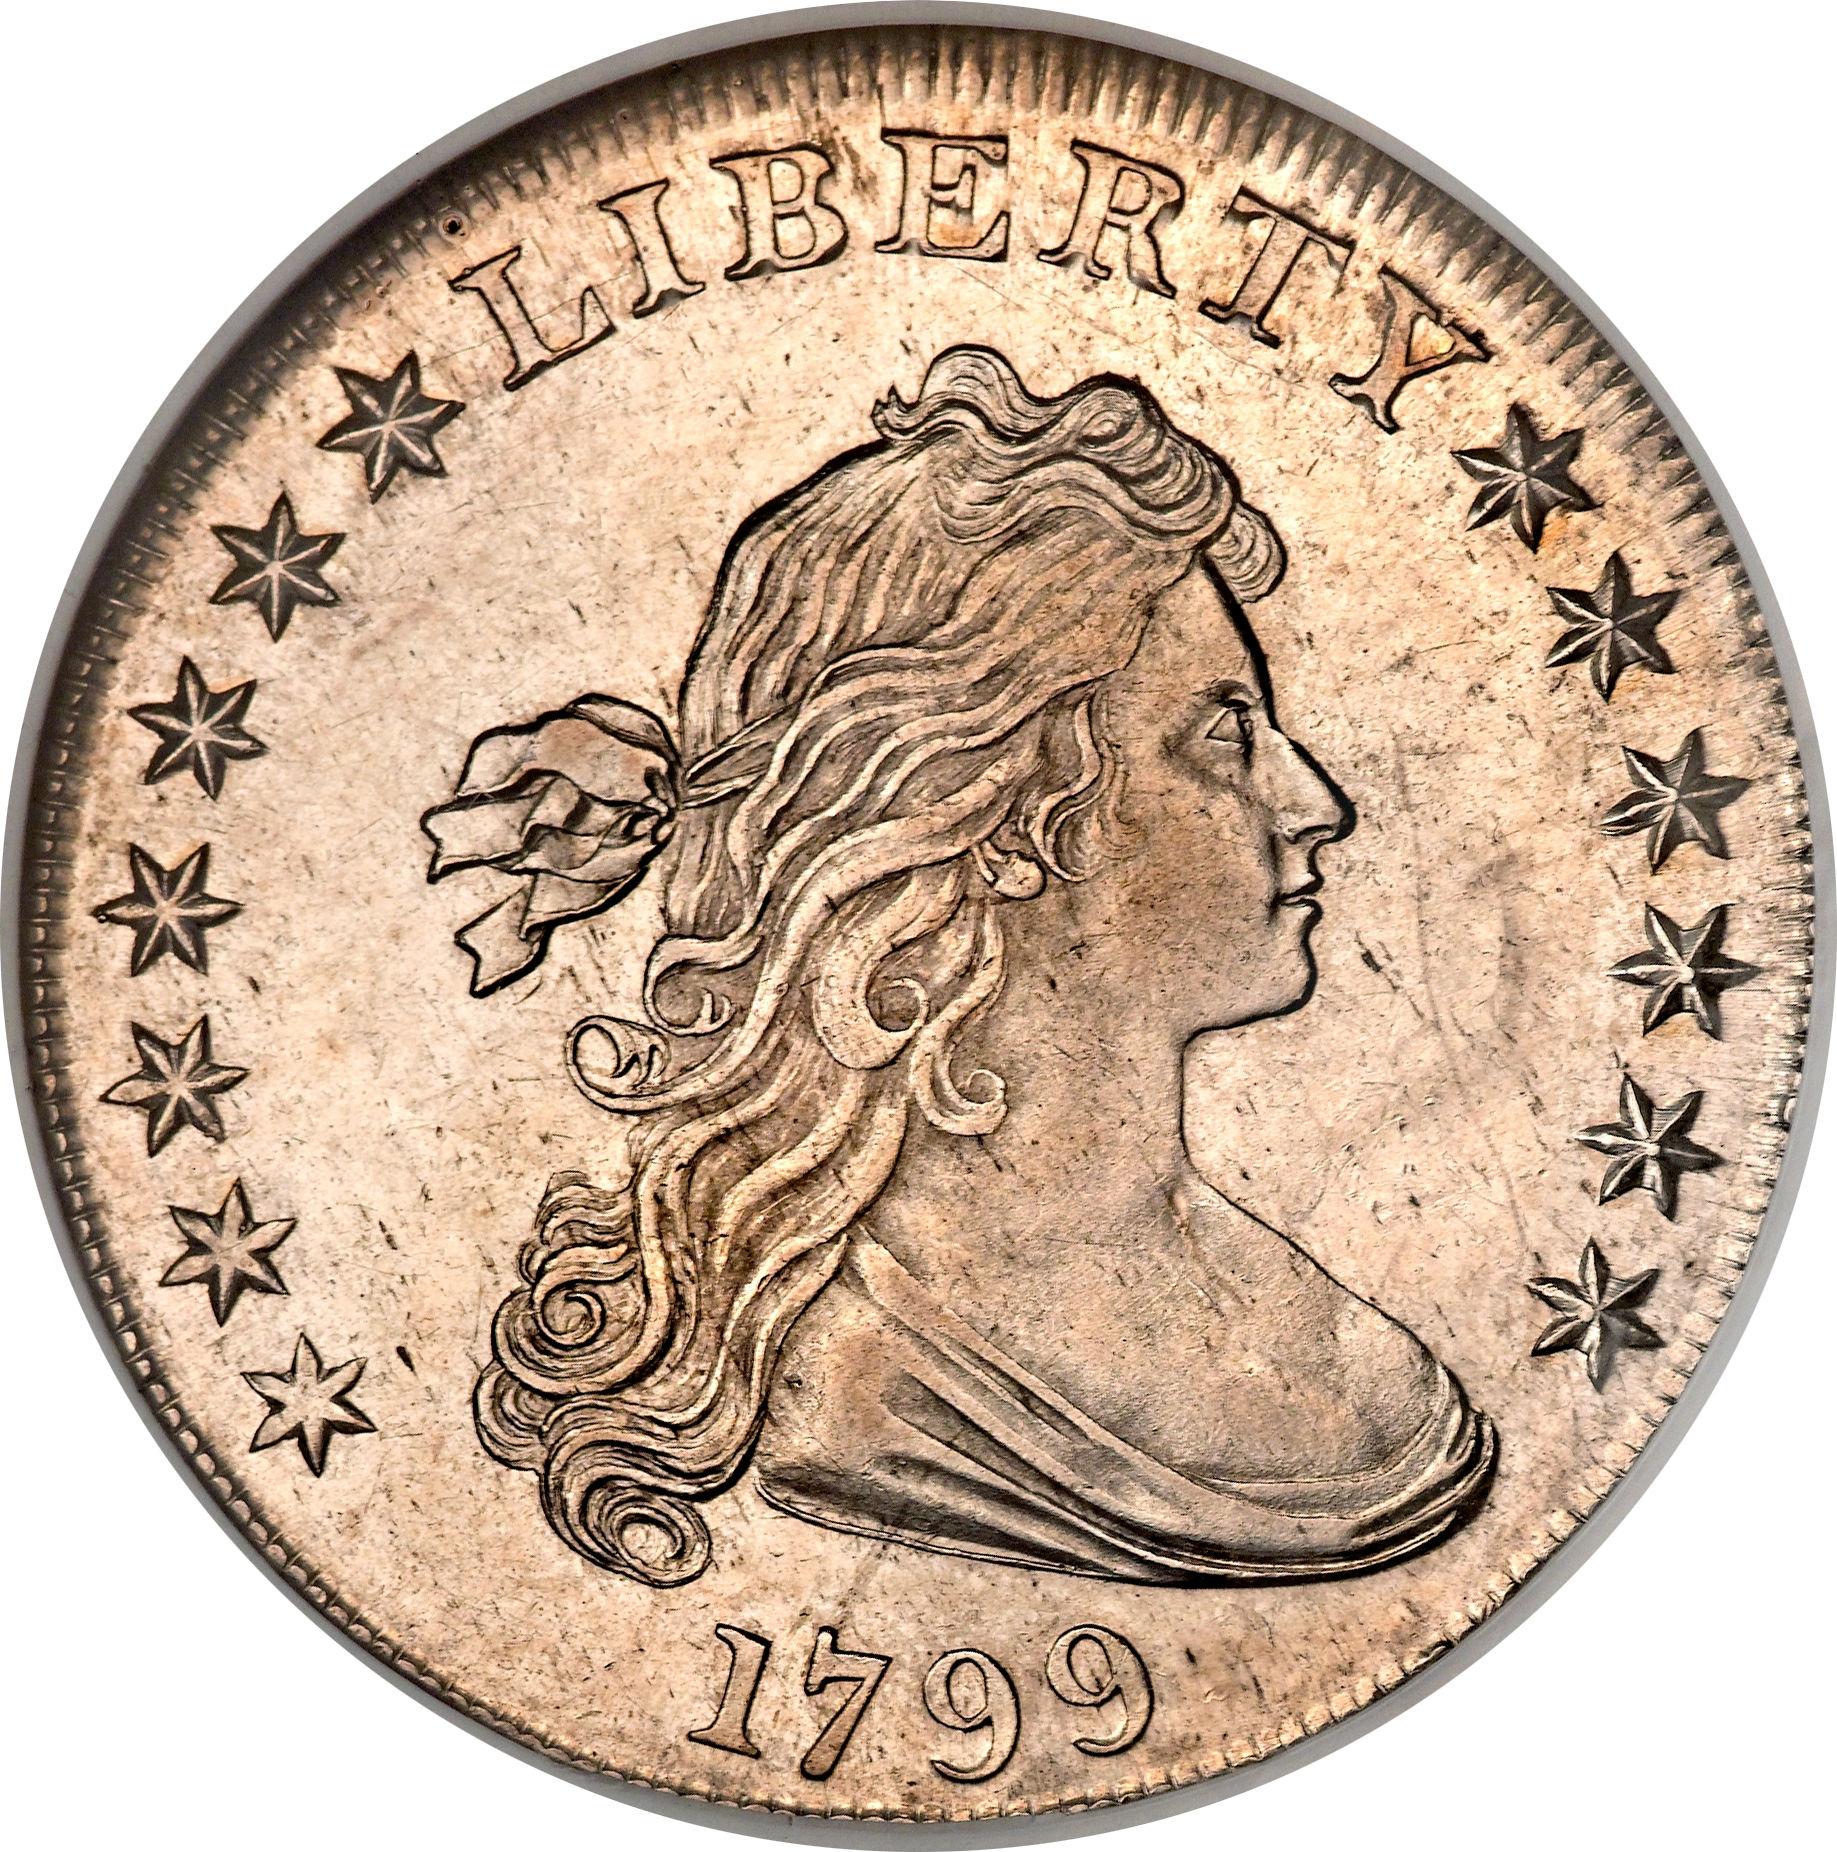 1 Dollar D Bust Heraldic Eagle